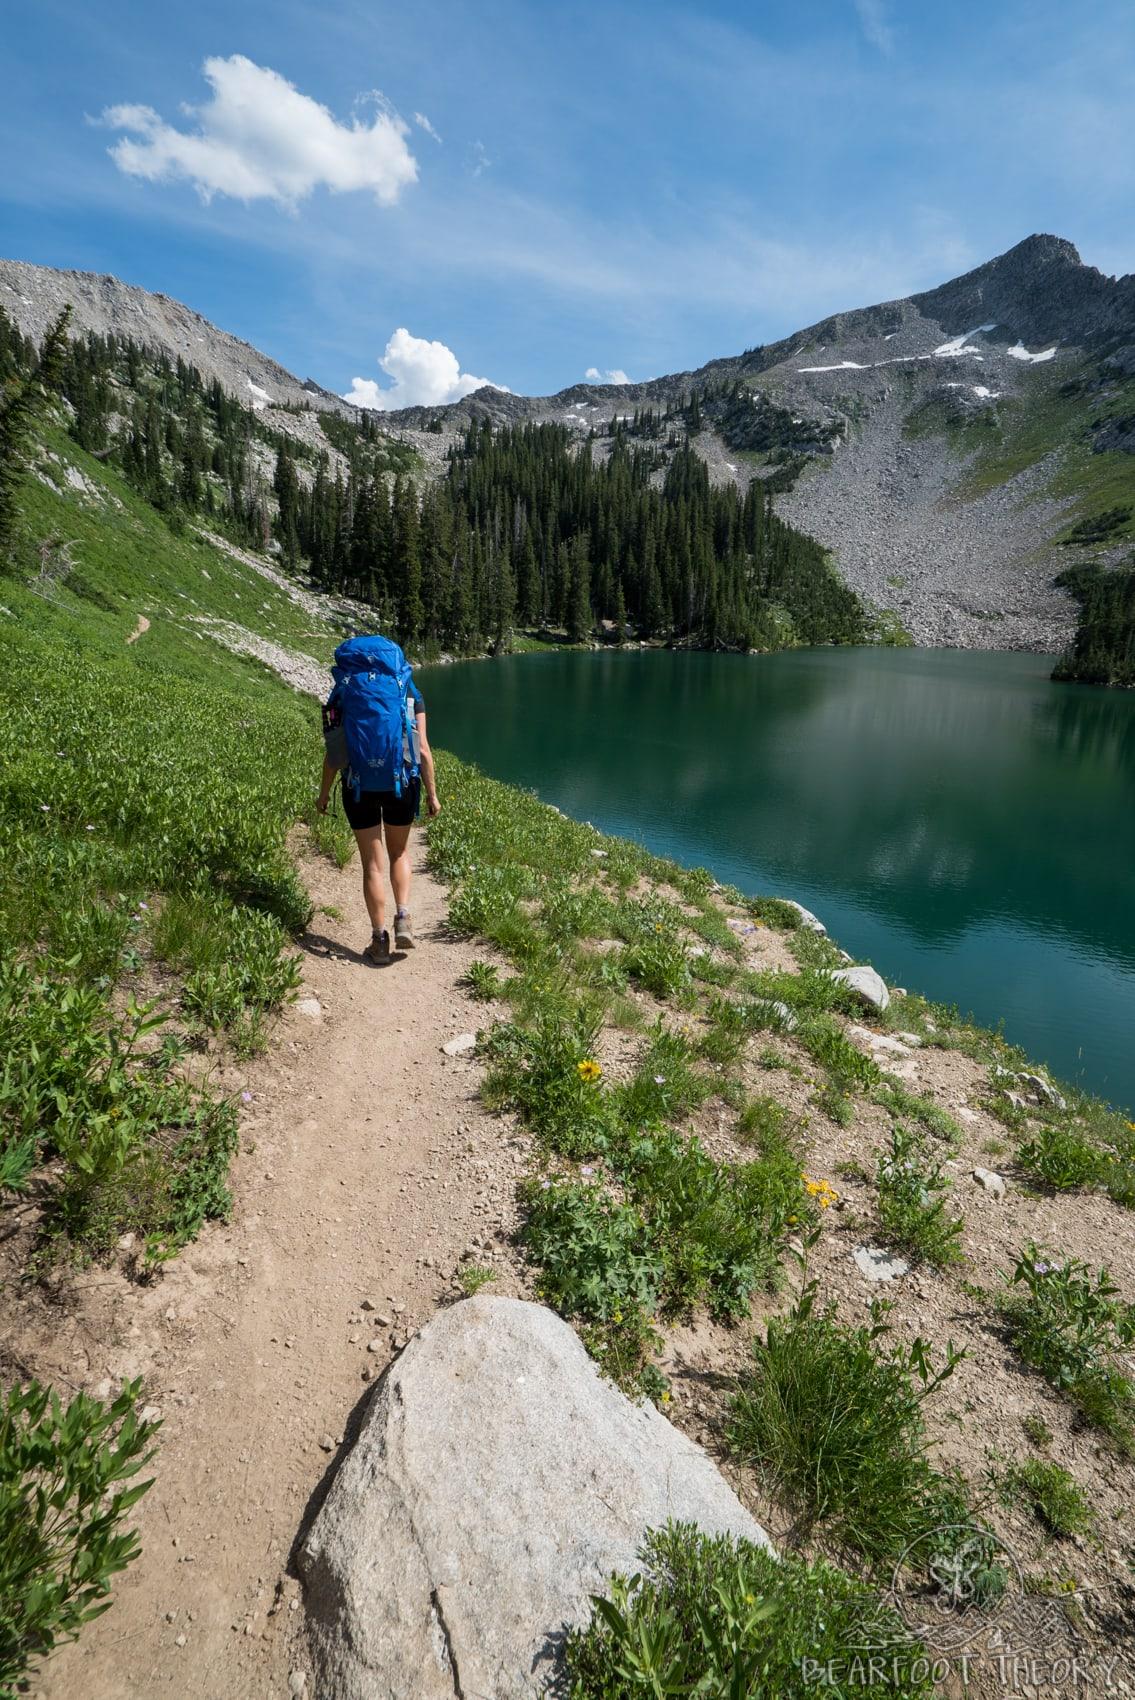 Hiking past Red Pine Lake on the way to the Pfeifferhorn, the third tallest peak near Salt Lake City